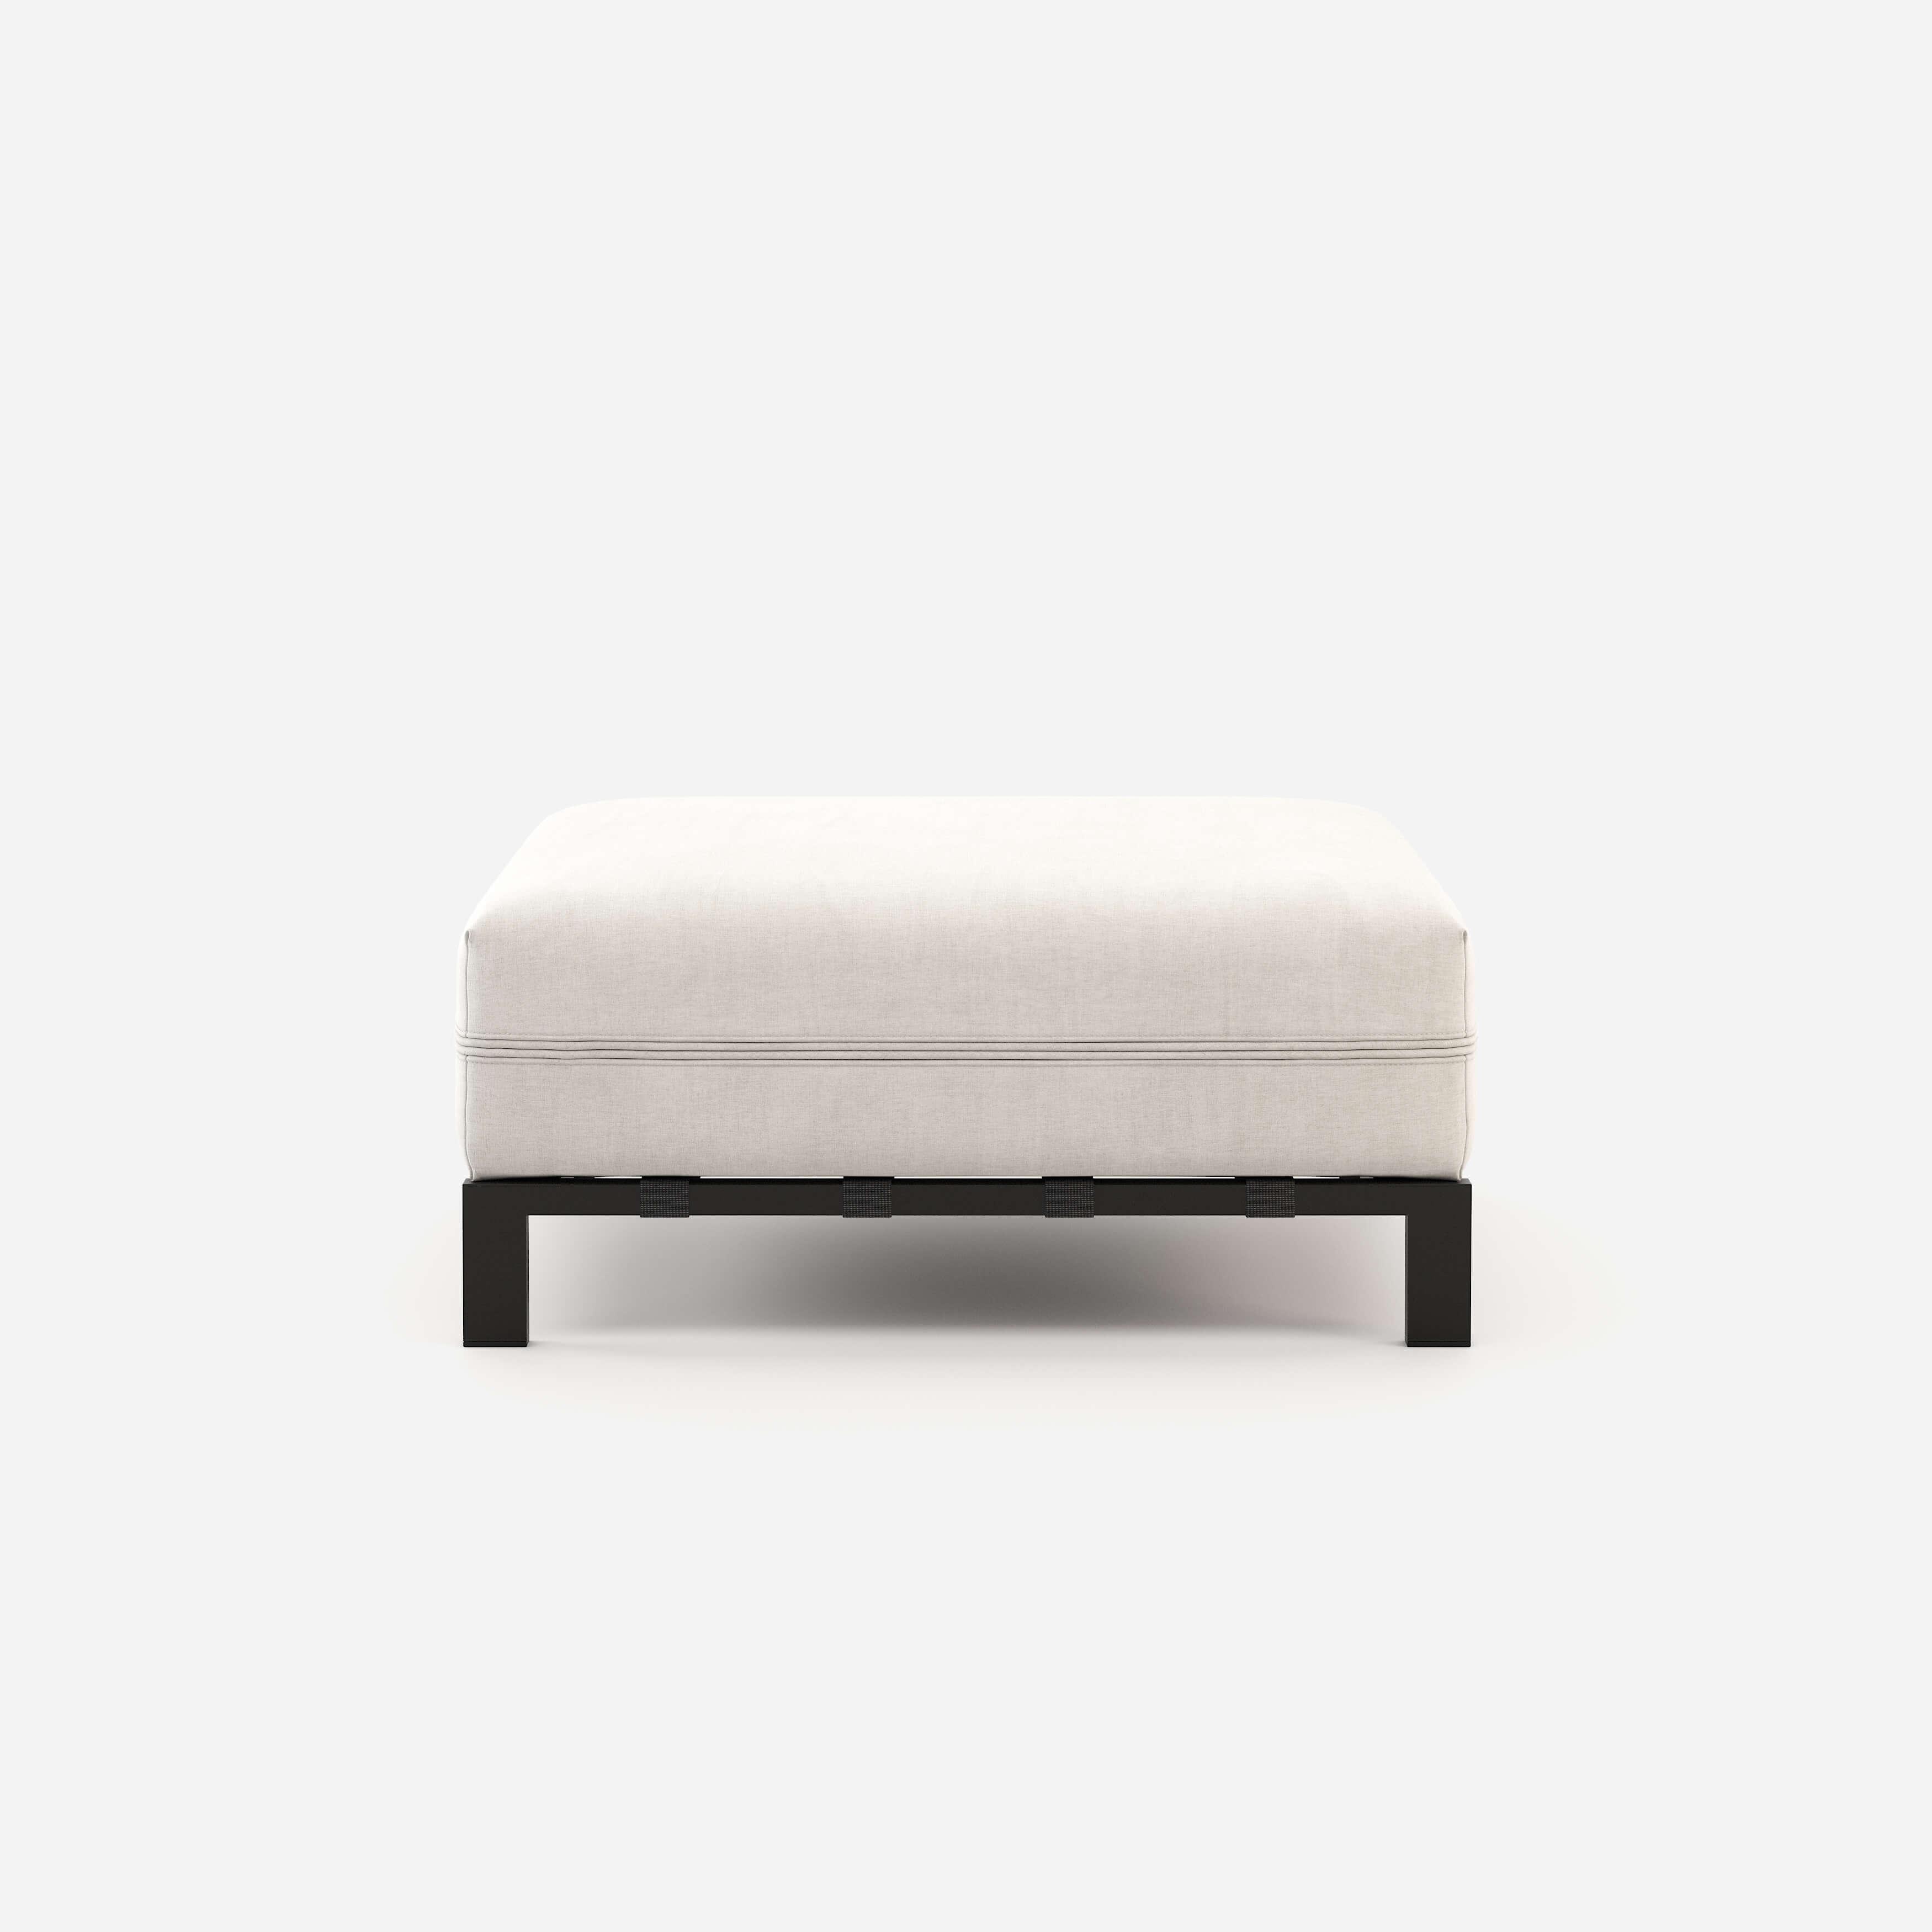 Bondi-Pouf-outdoor-collection-domkapa-interior-design-home-decor-furniture-white-trends-2